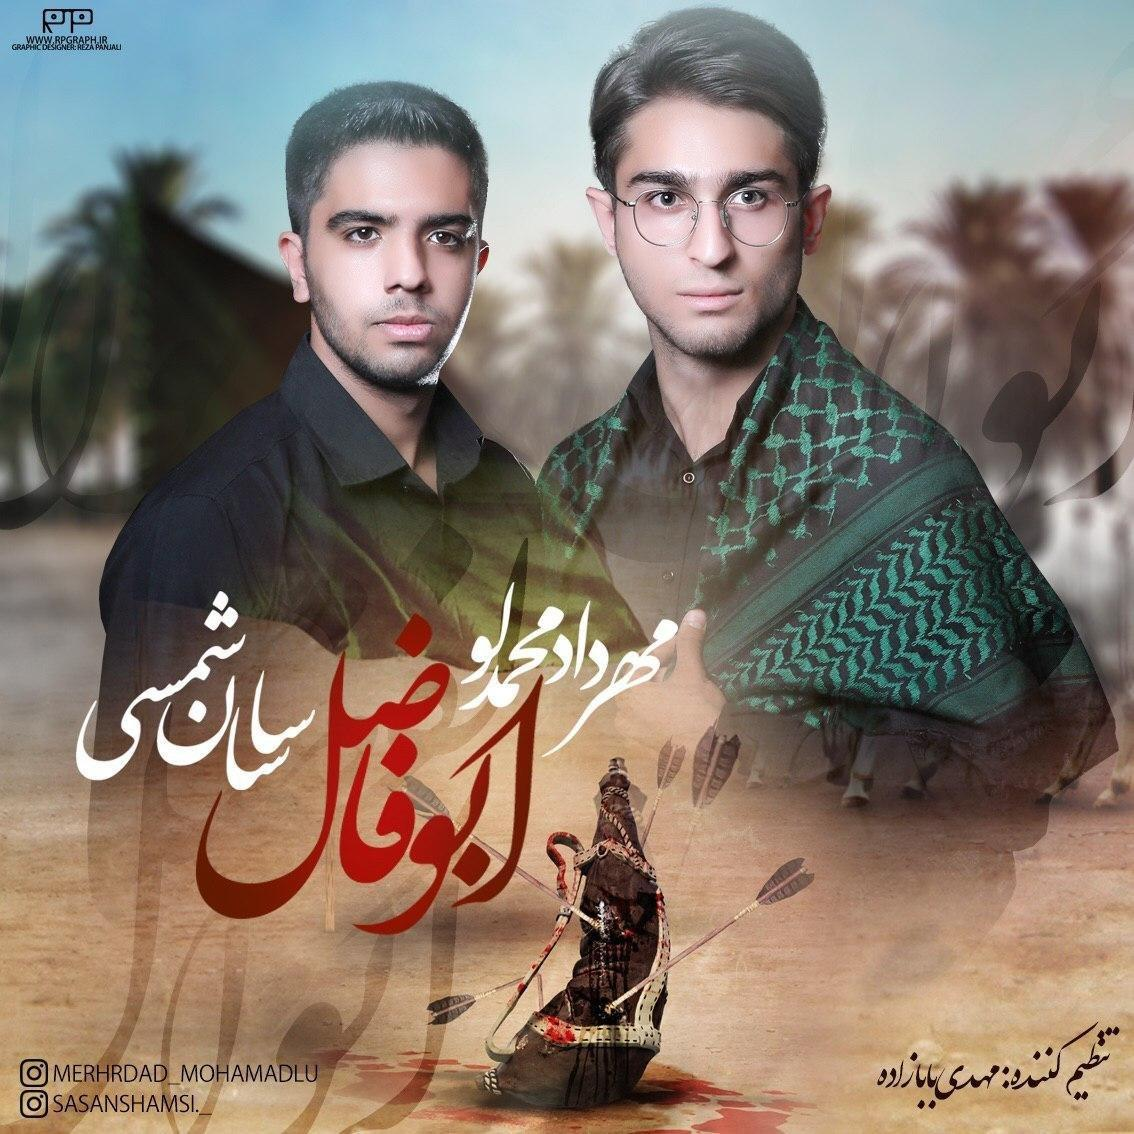 http://s10.picofile.com/file/8407339818/09Mehrdad_Mohammadlou_Ft_Sasan_Shamsi_Abufazel.jpg